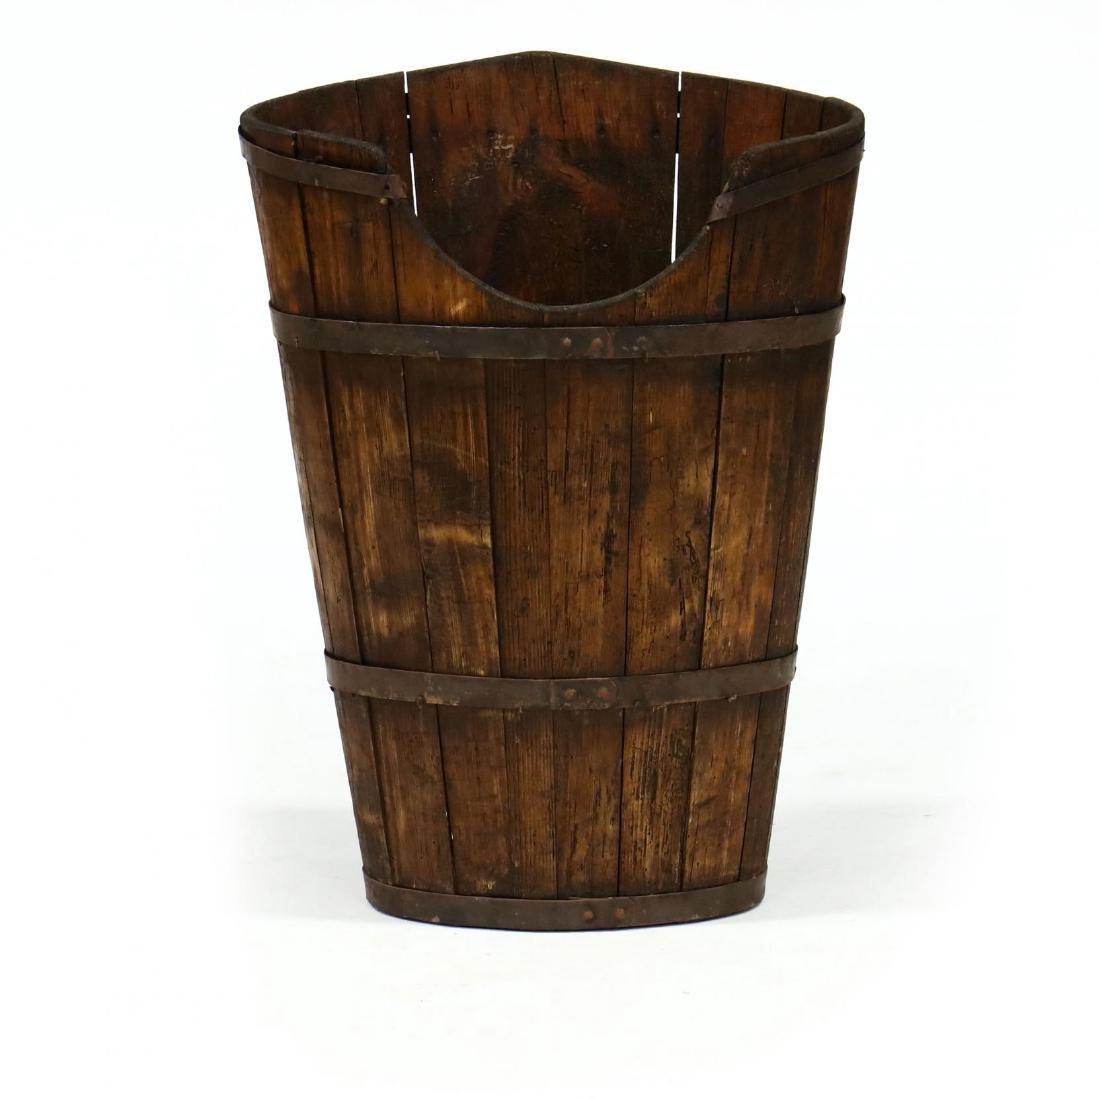 Antique French  Hotte  Grape Gathering Barrel